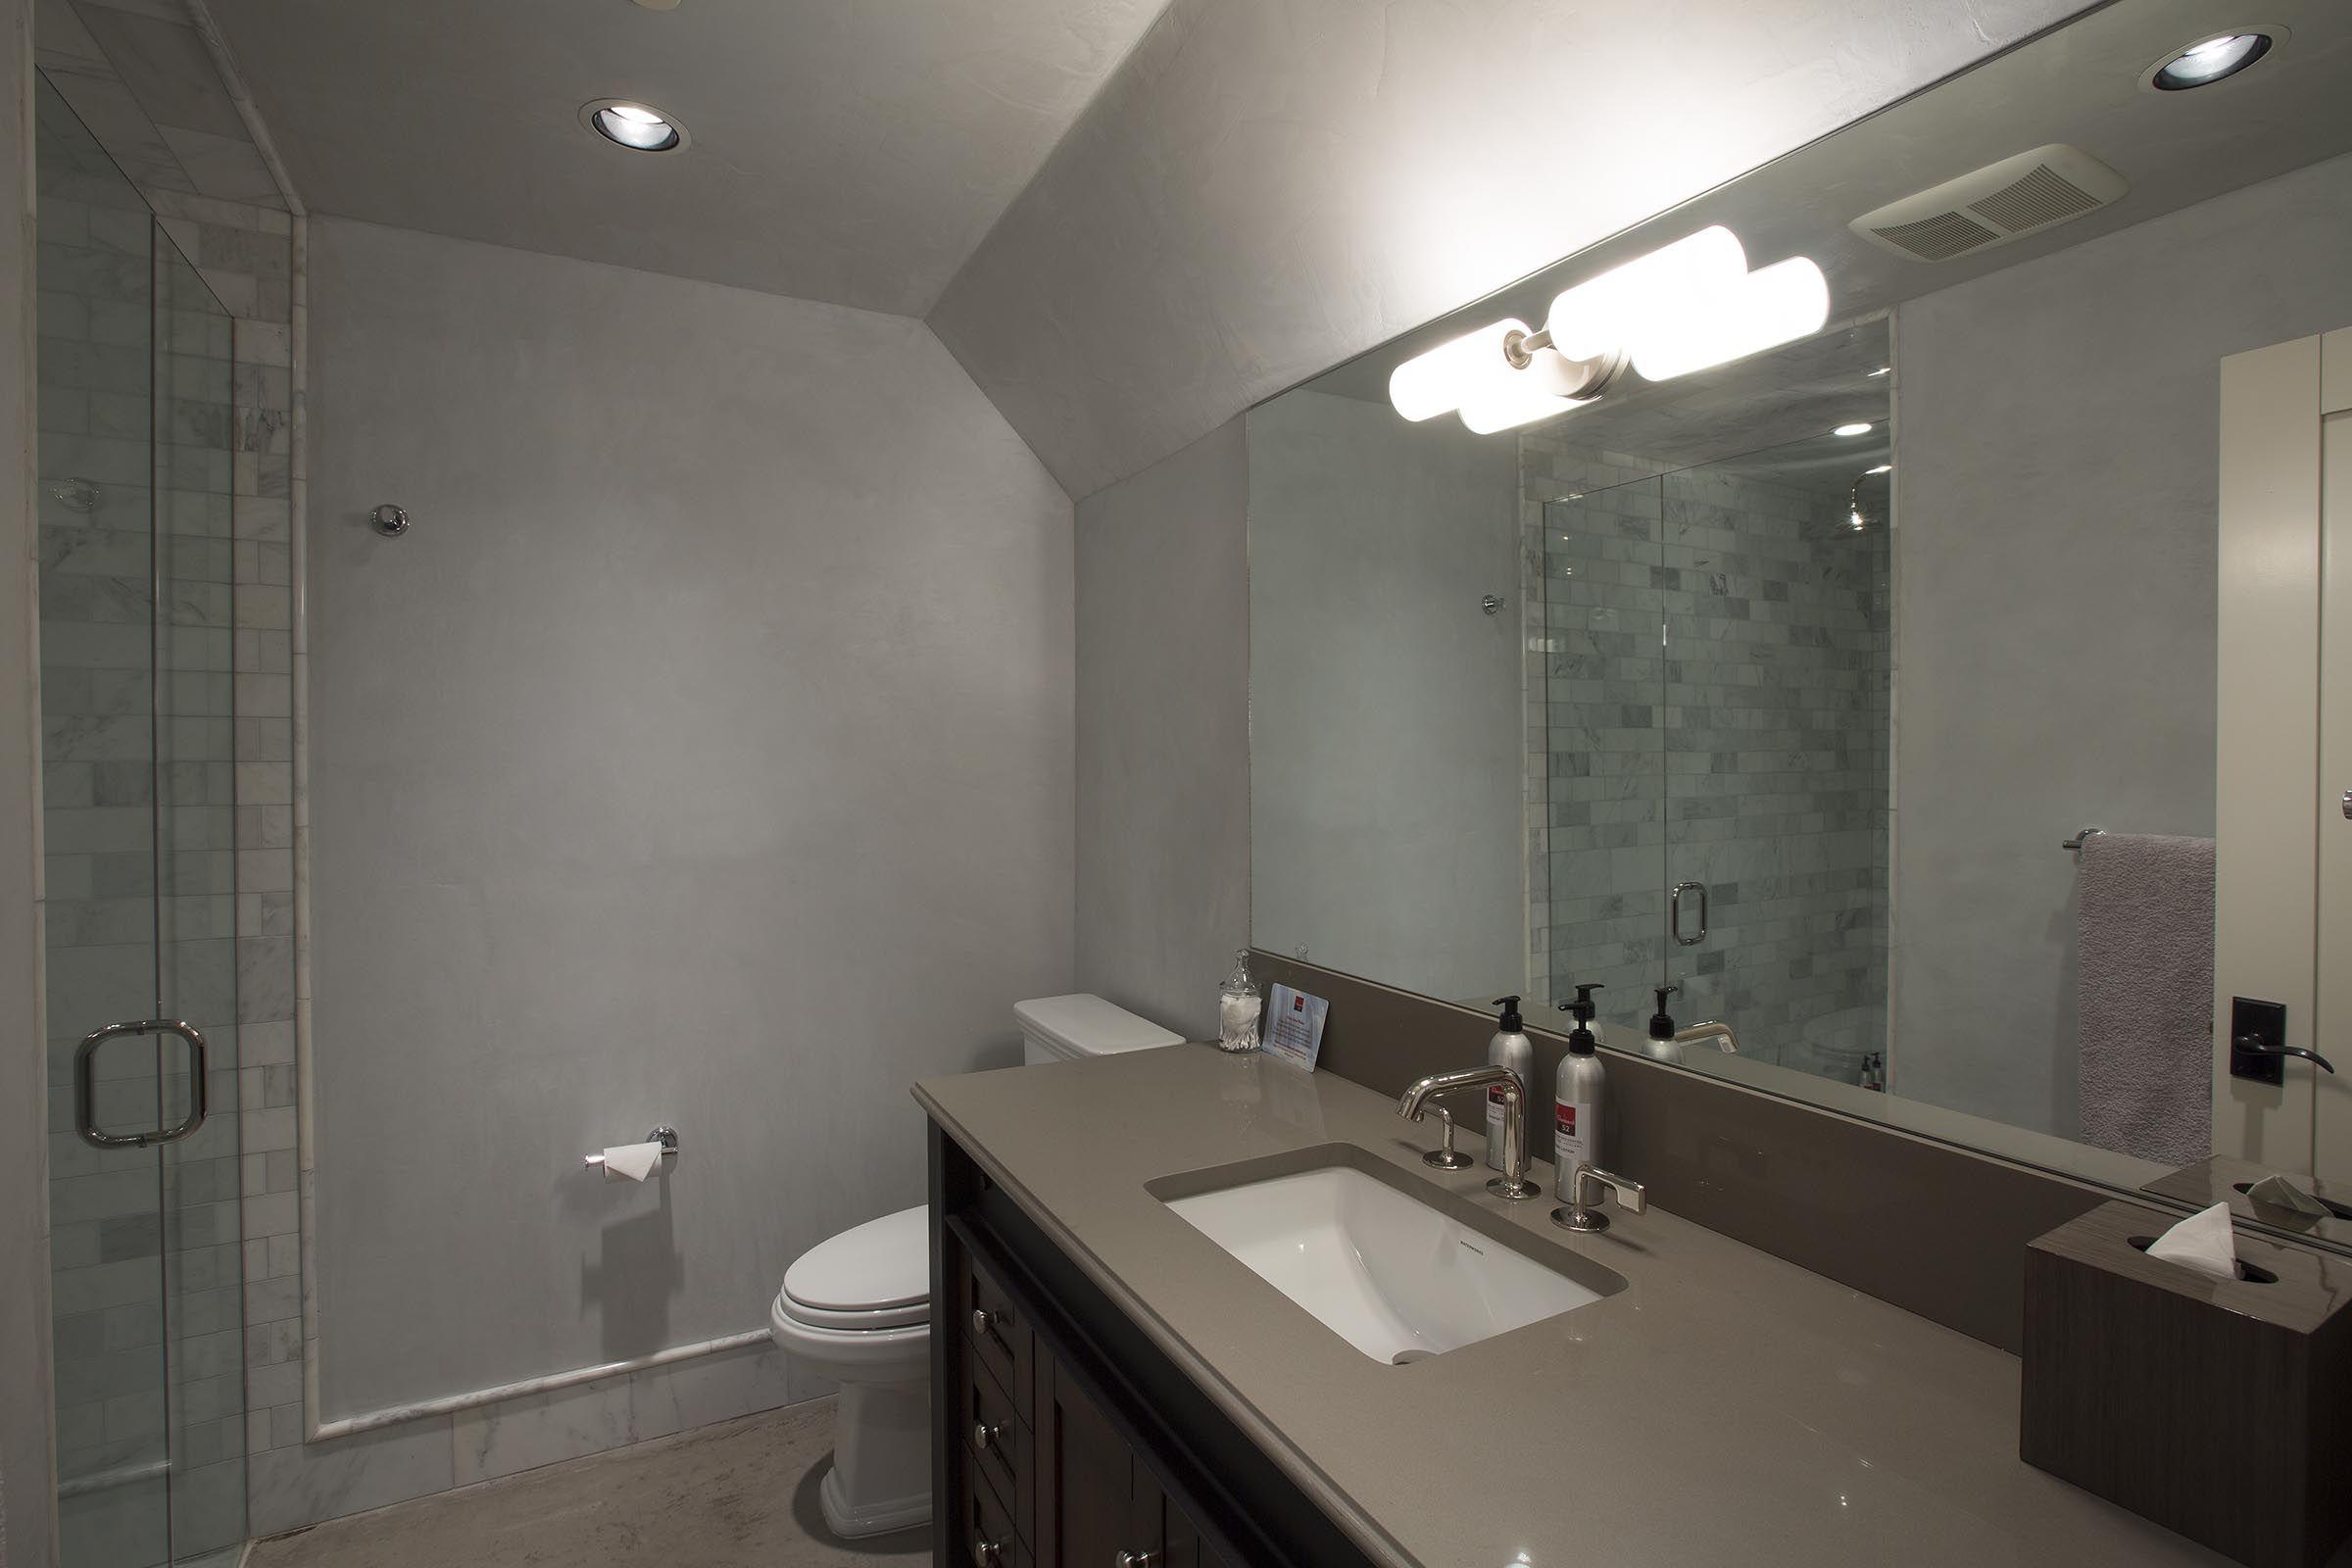 West Building - W301 Guest Bathroom -  3 Bedrooms  4.5 Bathrooms  http://element52.aubergeresorts.com/